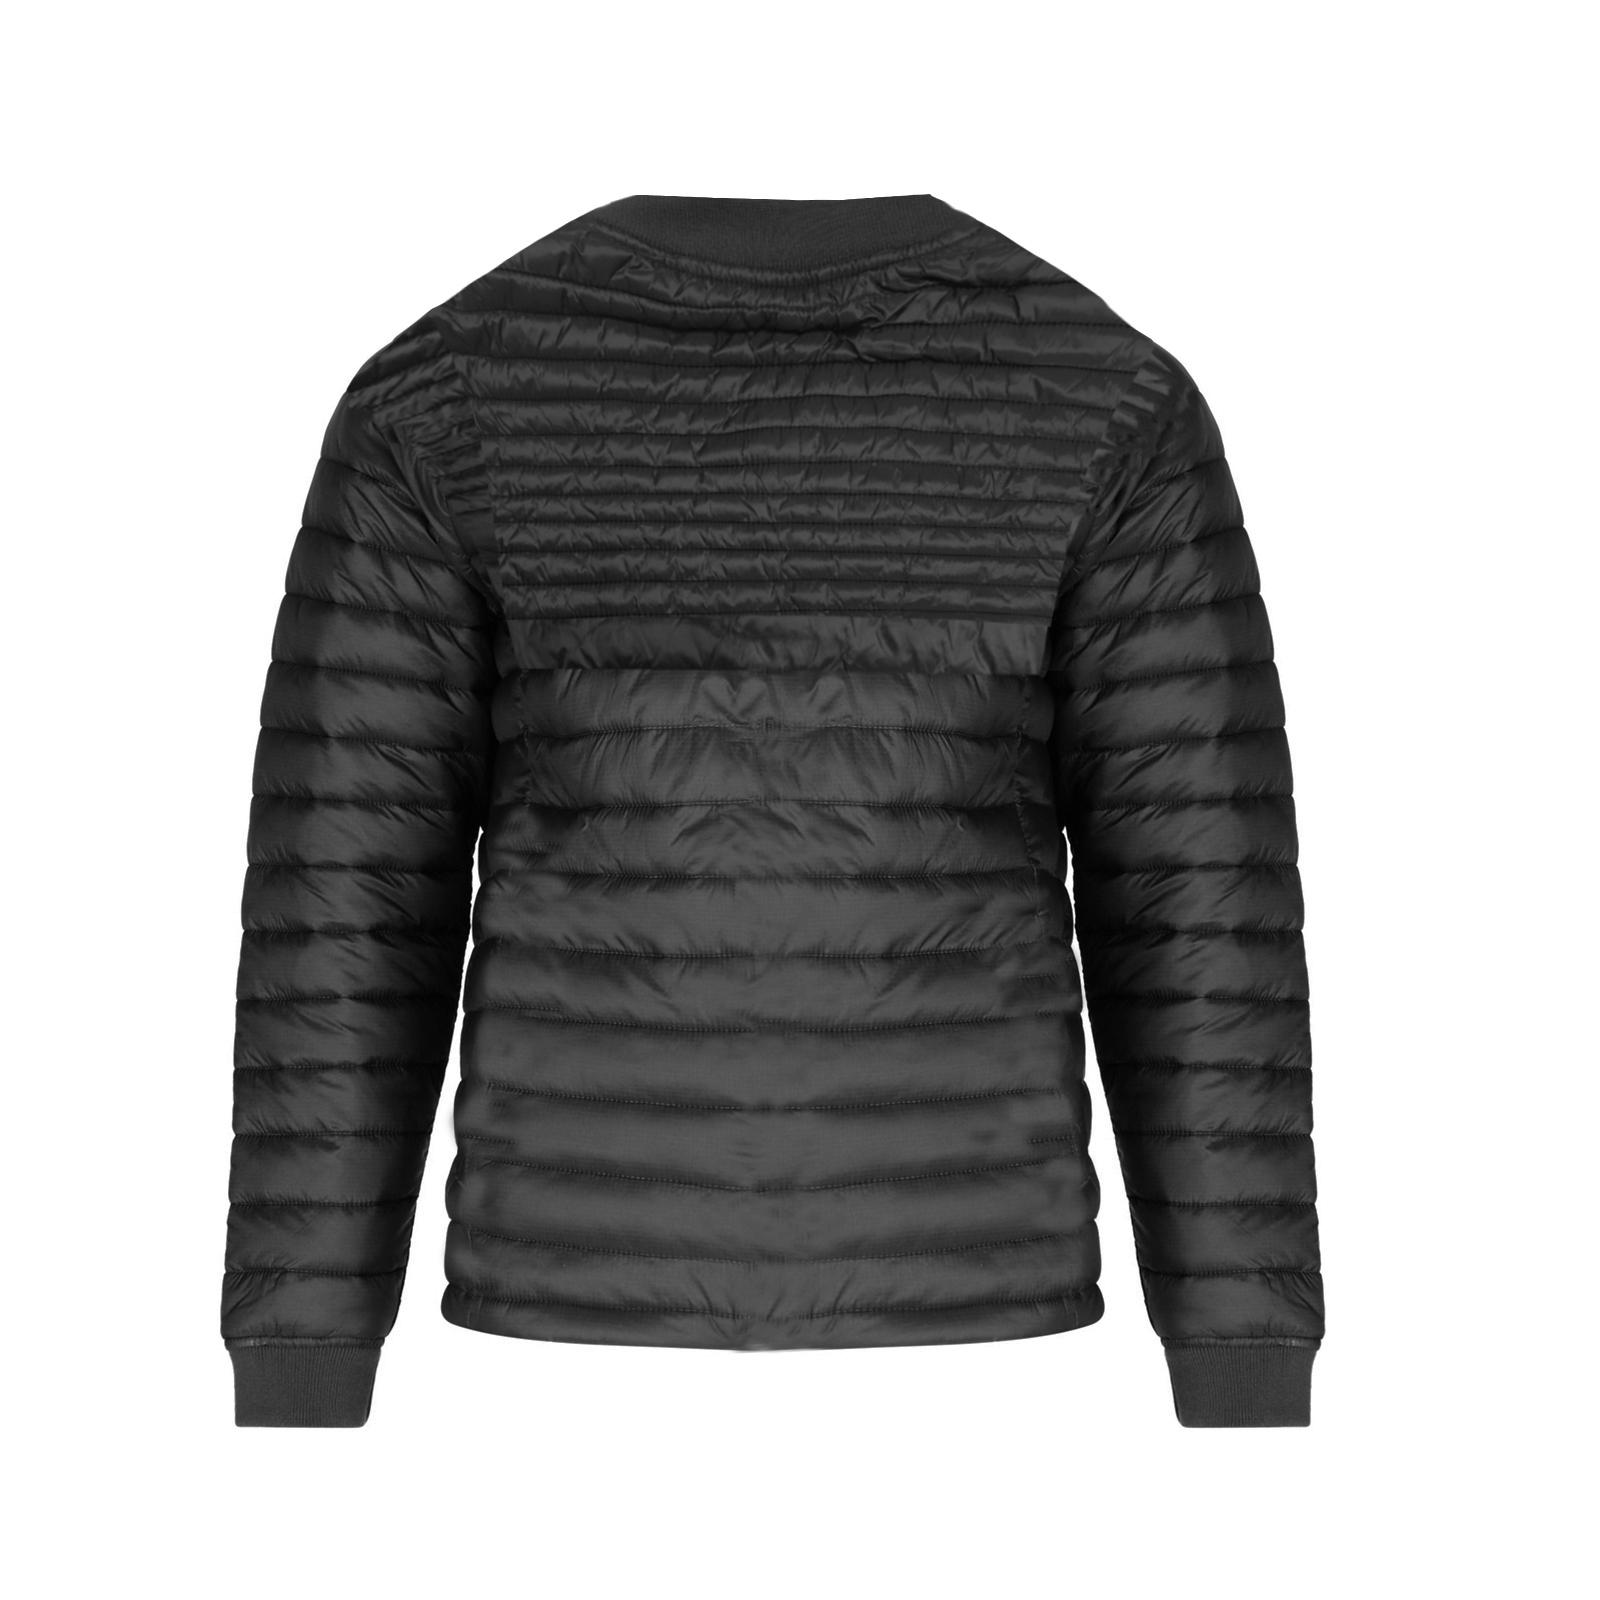 Threadbare-Mens-Naples-MA1-Bomber-Jacket-Designer-Quilted-Winter-Padded-Coat thumbnail 3